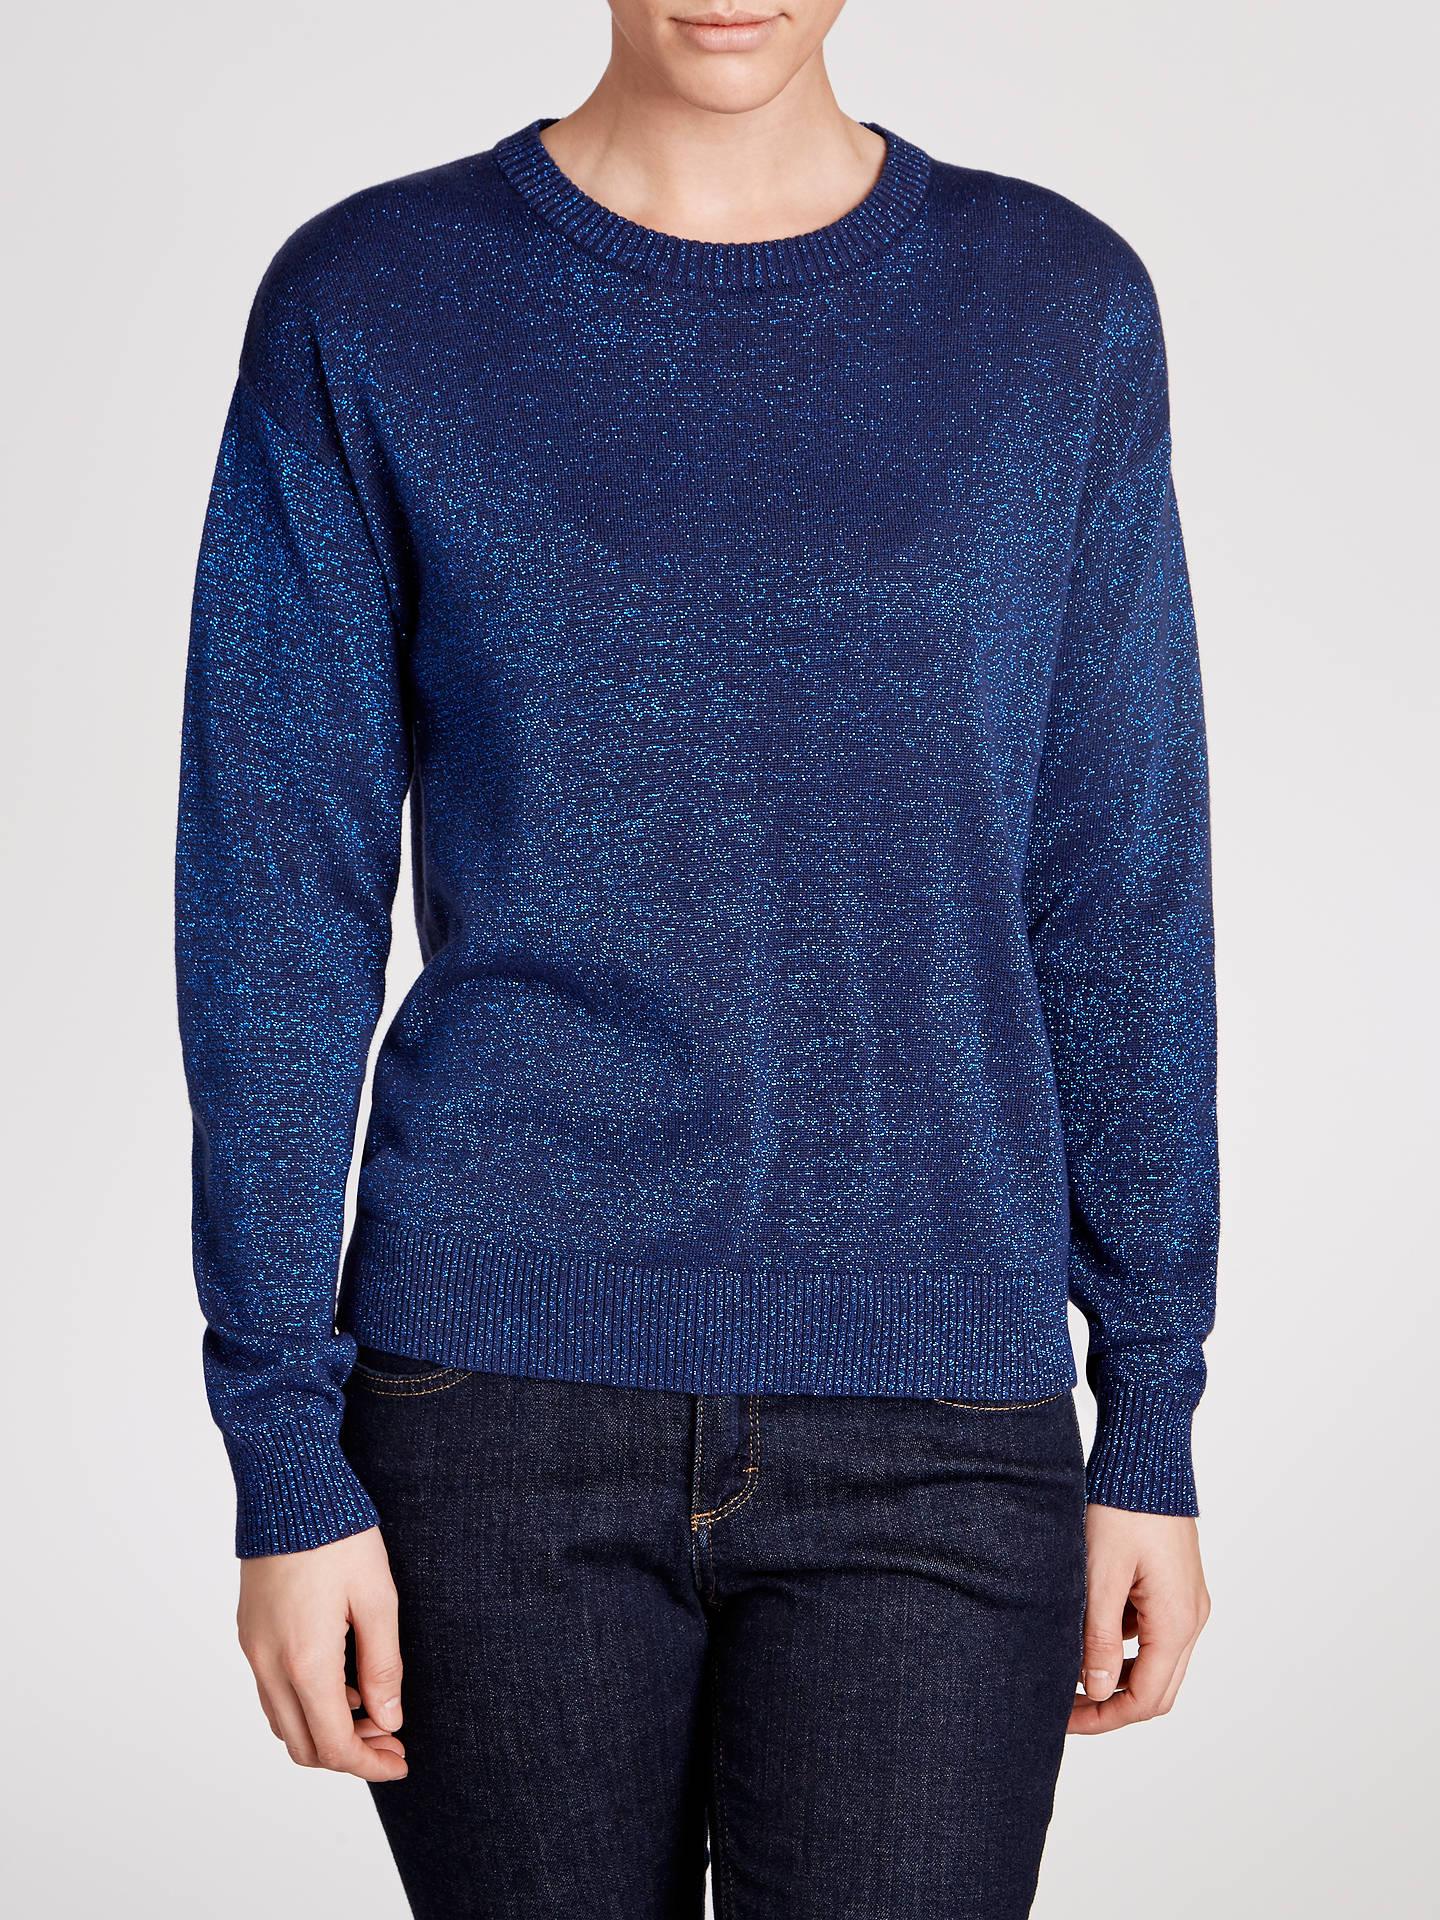 3aed9824f1b04 Buy Minimum Adona Lurex Crew Knitted Jumper